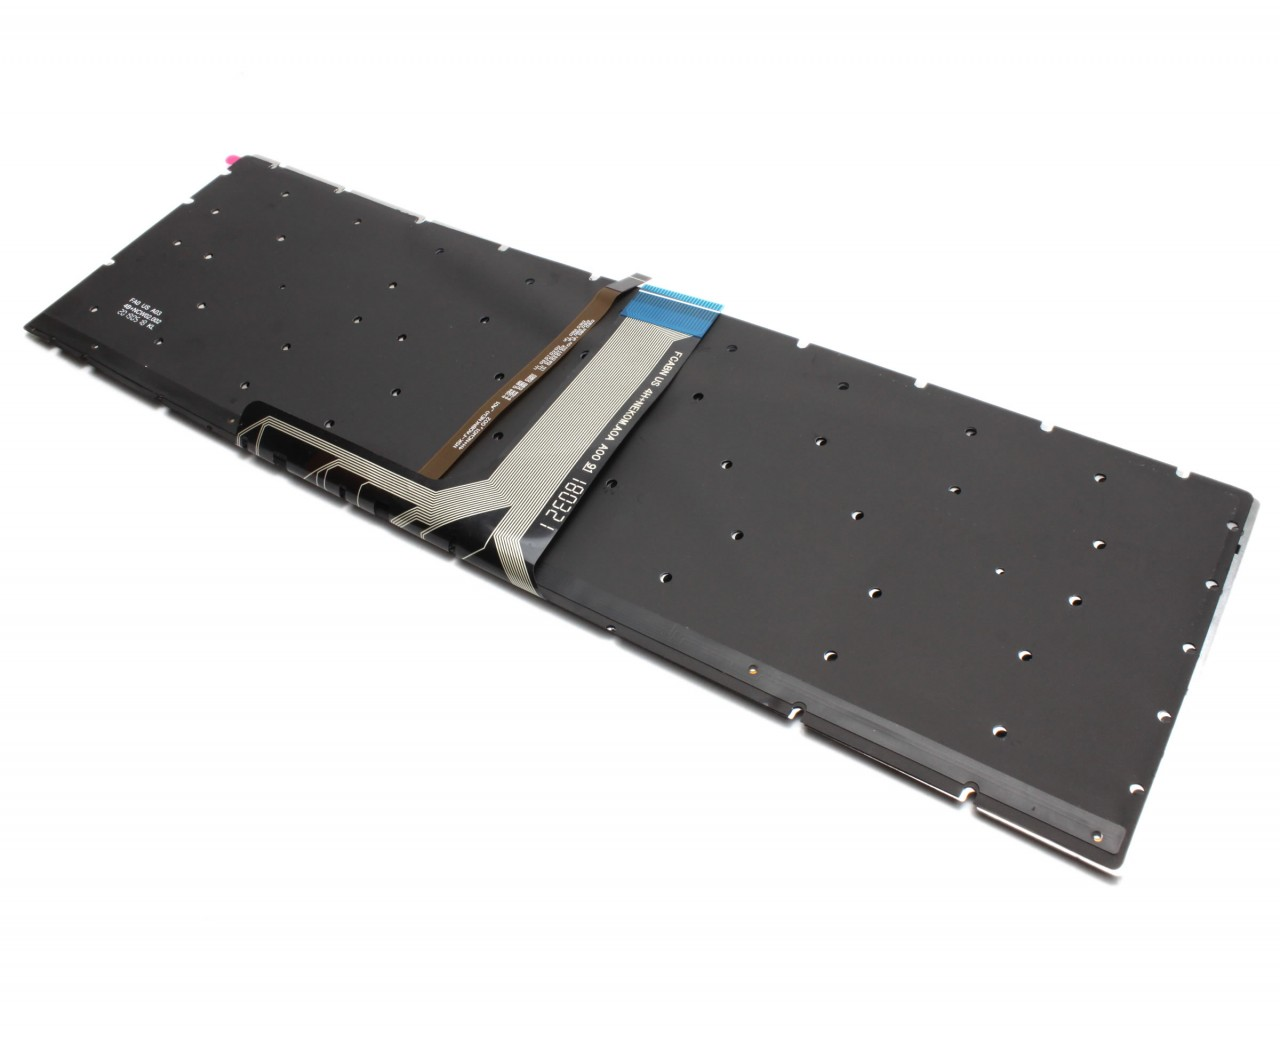 Tastatura MSI GF72VR 7RF iluminata layout US fara rama enter mic imagine powerlaptop.ro 2021